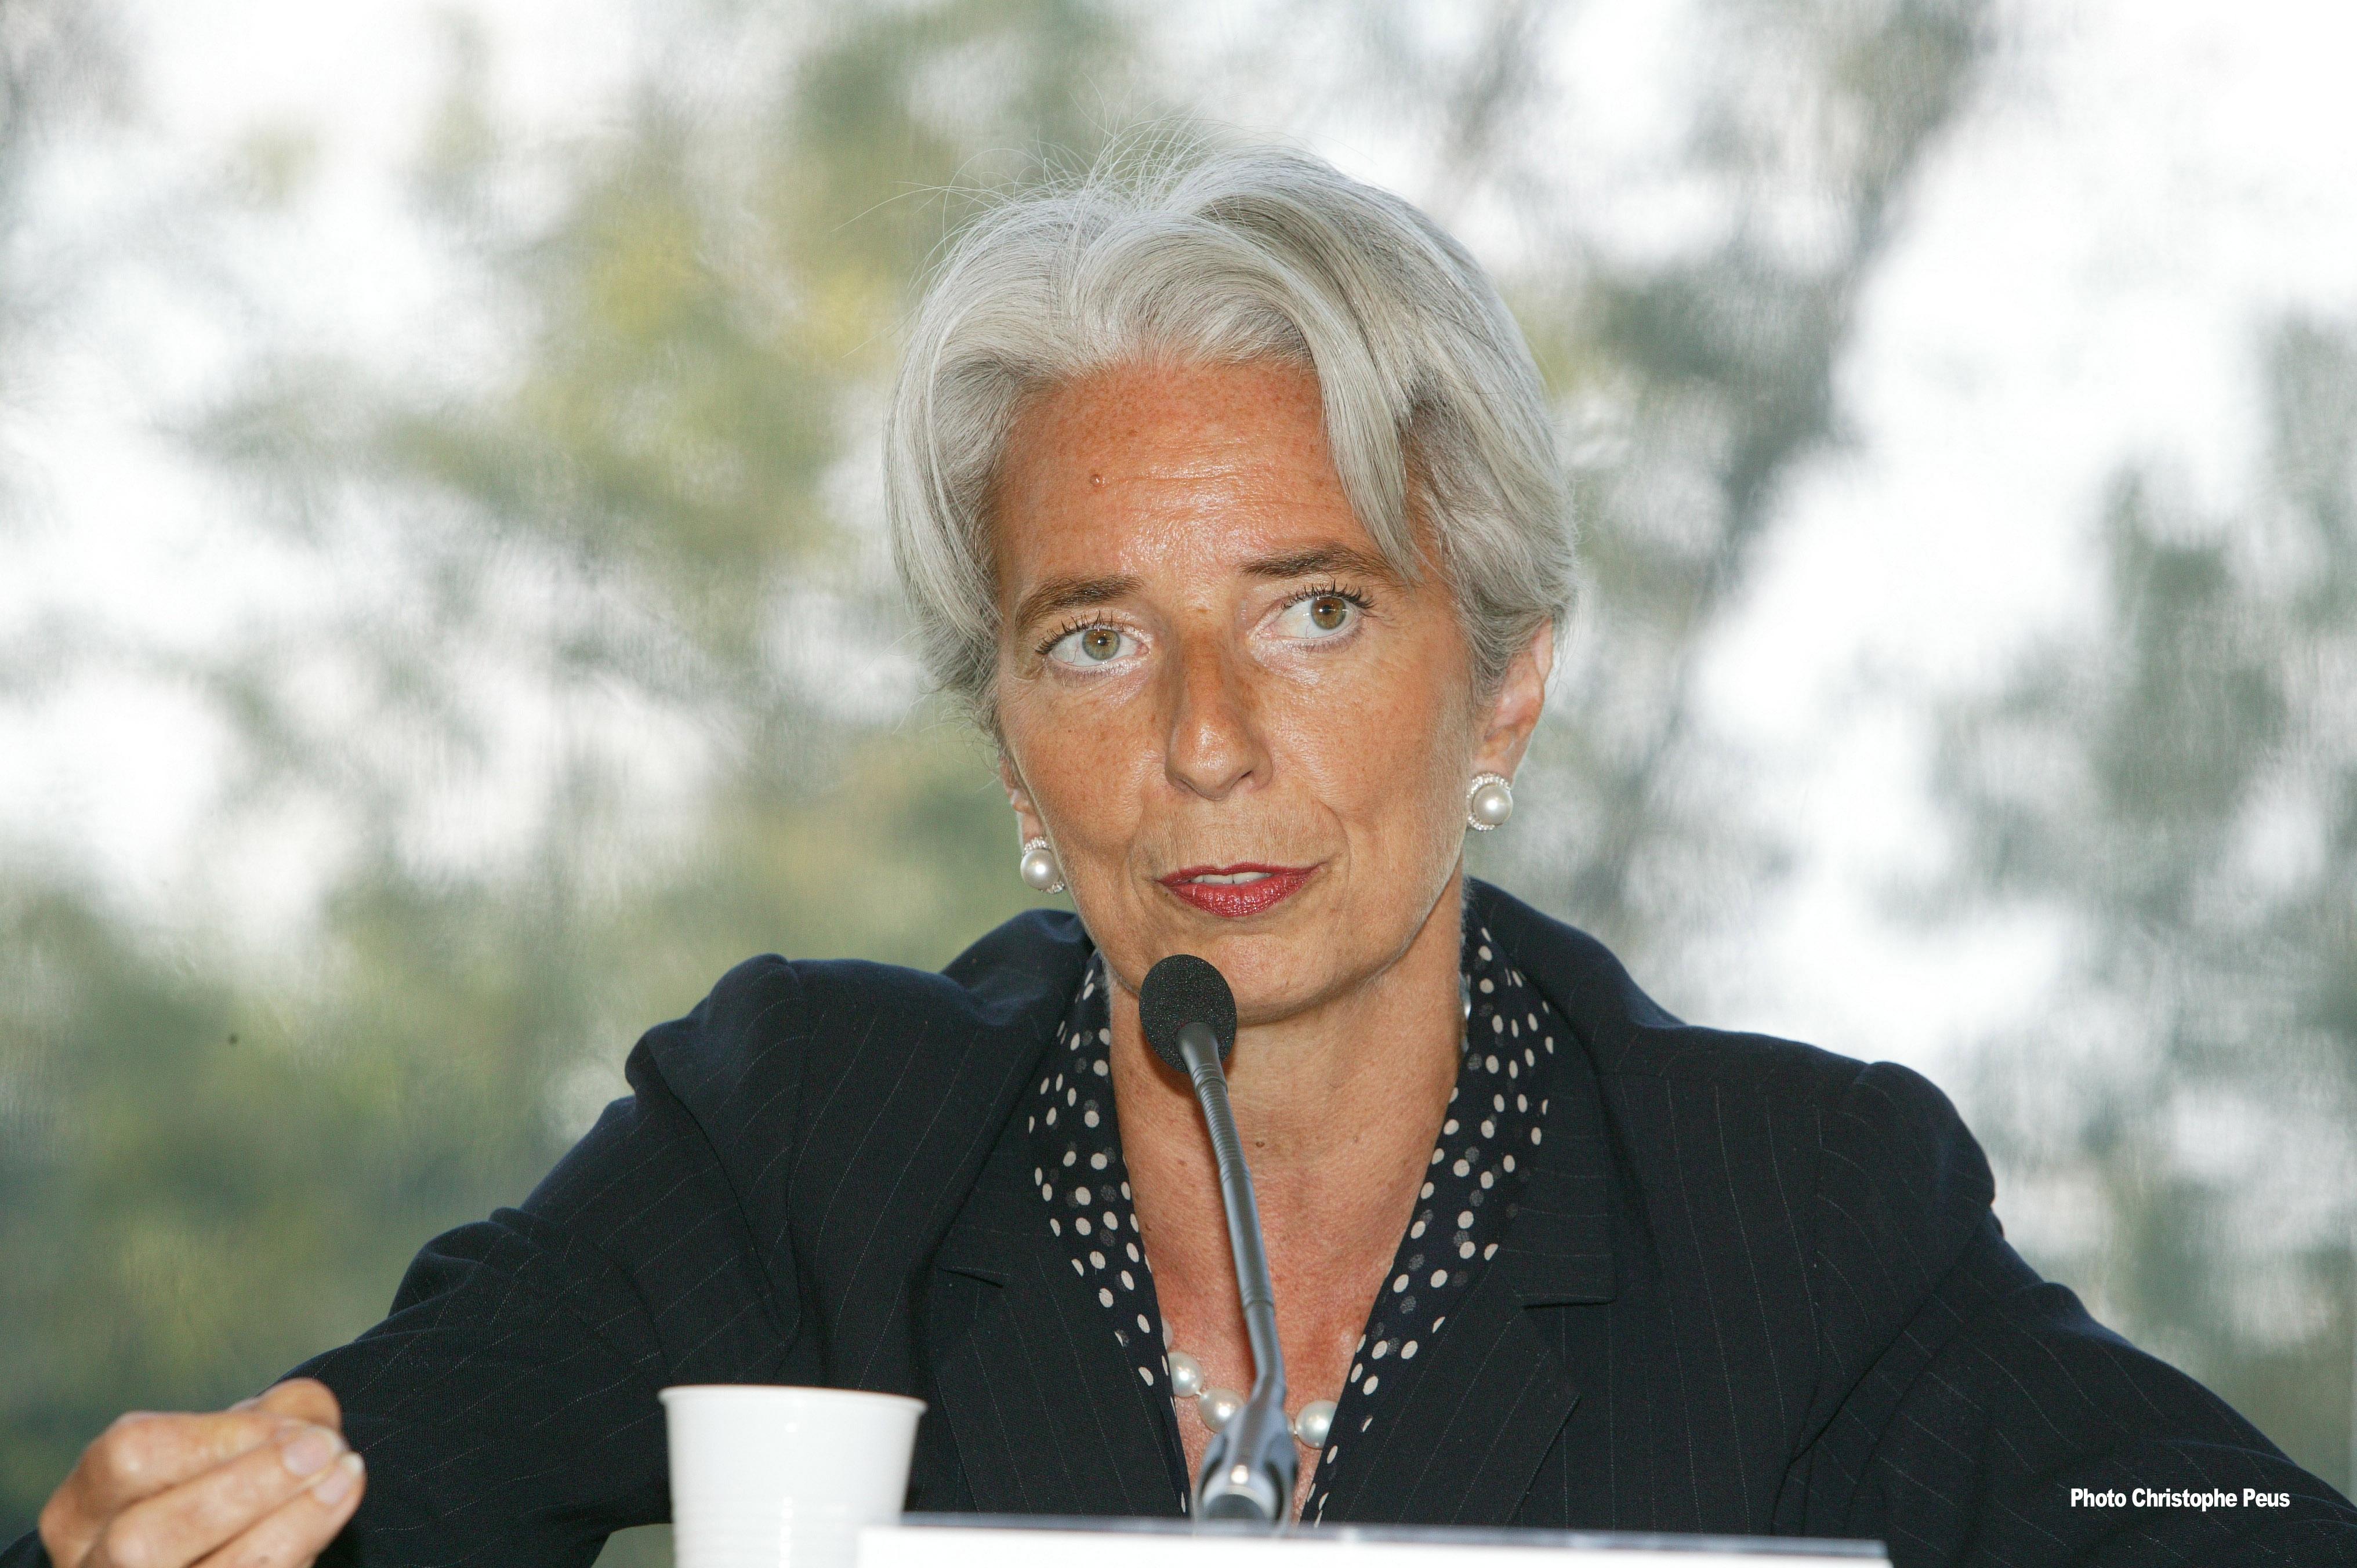 File:Christine Lagarde.jpg - Wikimedia Commons